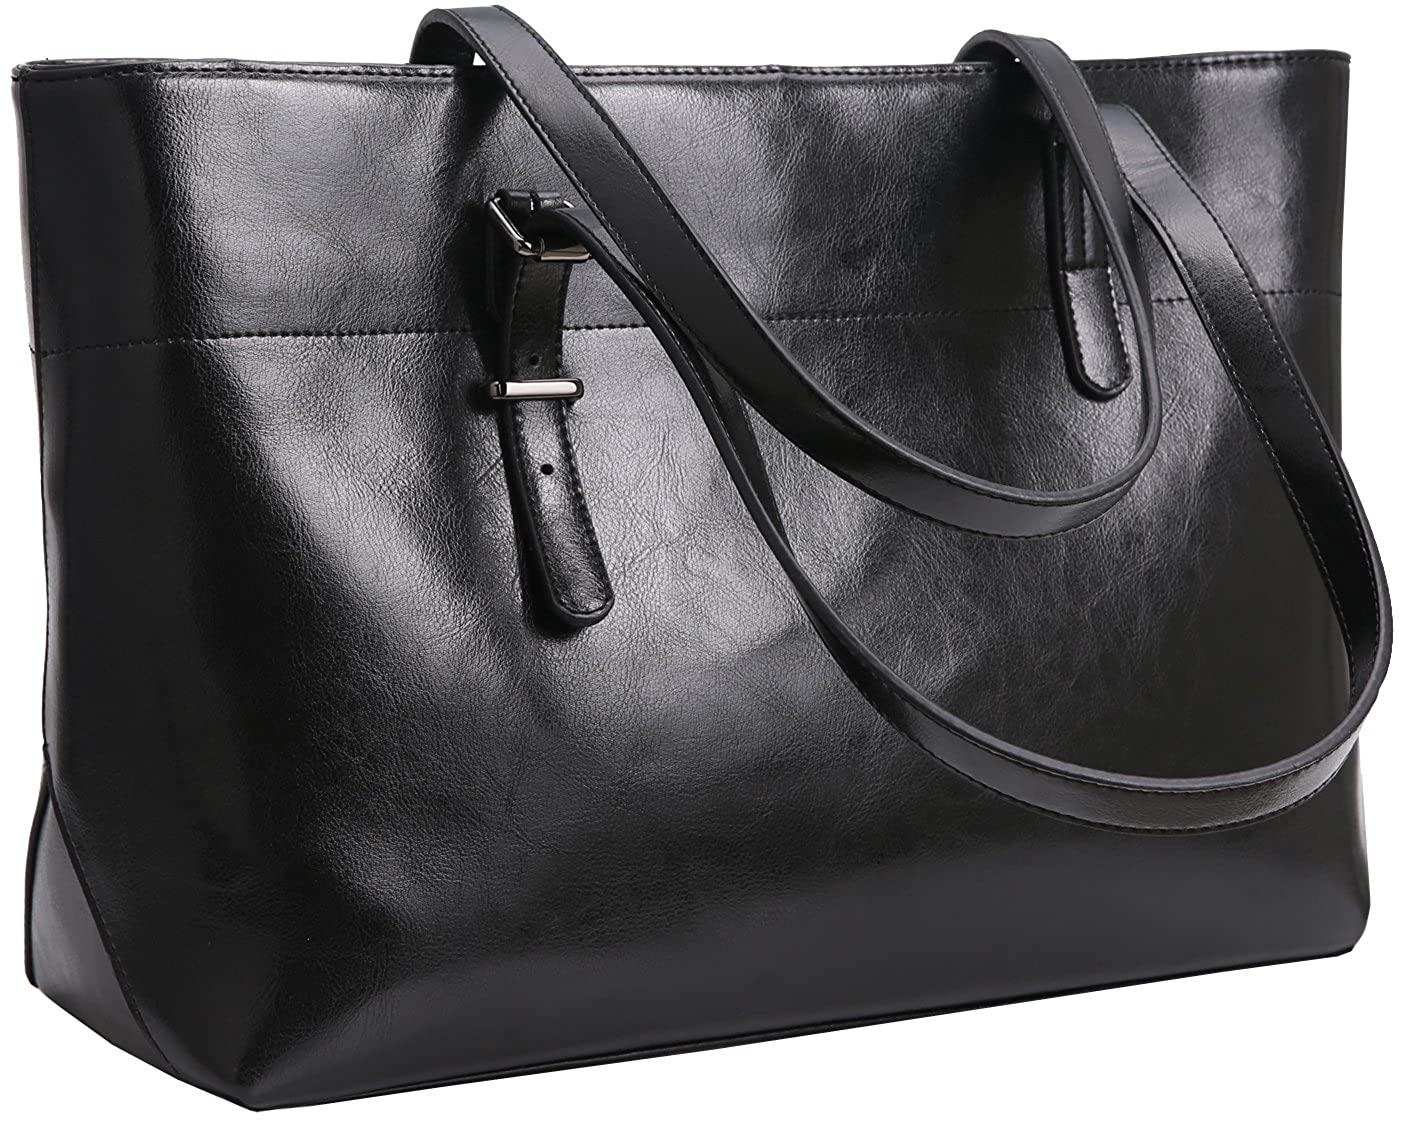 304267d0d73b Iswee Womens Leather Shoulder Handbag Tote Bags Top Handle Bag Designer  Ladies Purses Fashion Large Capacity Bags